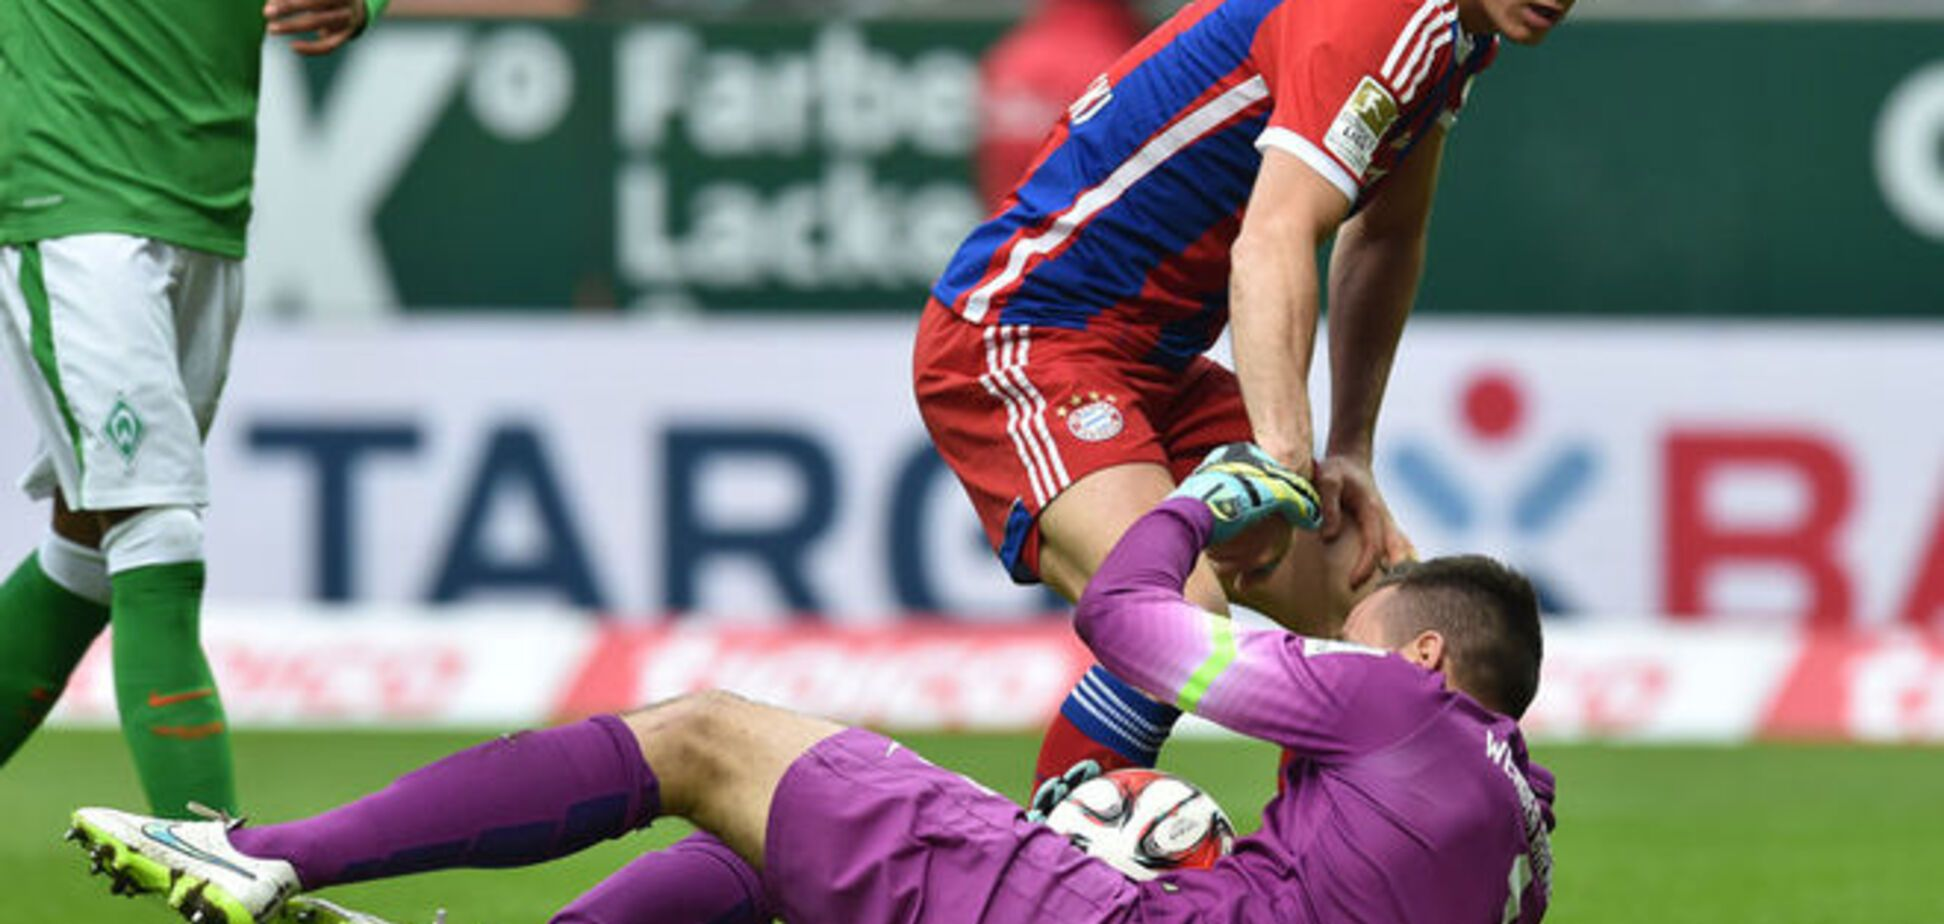 Вердер - Бавария - 0-4: видео-обзор матча